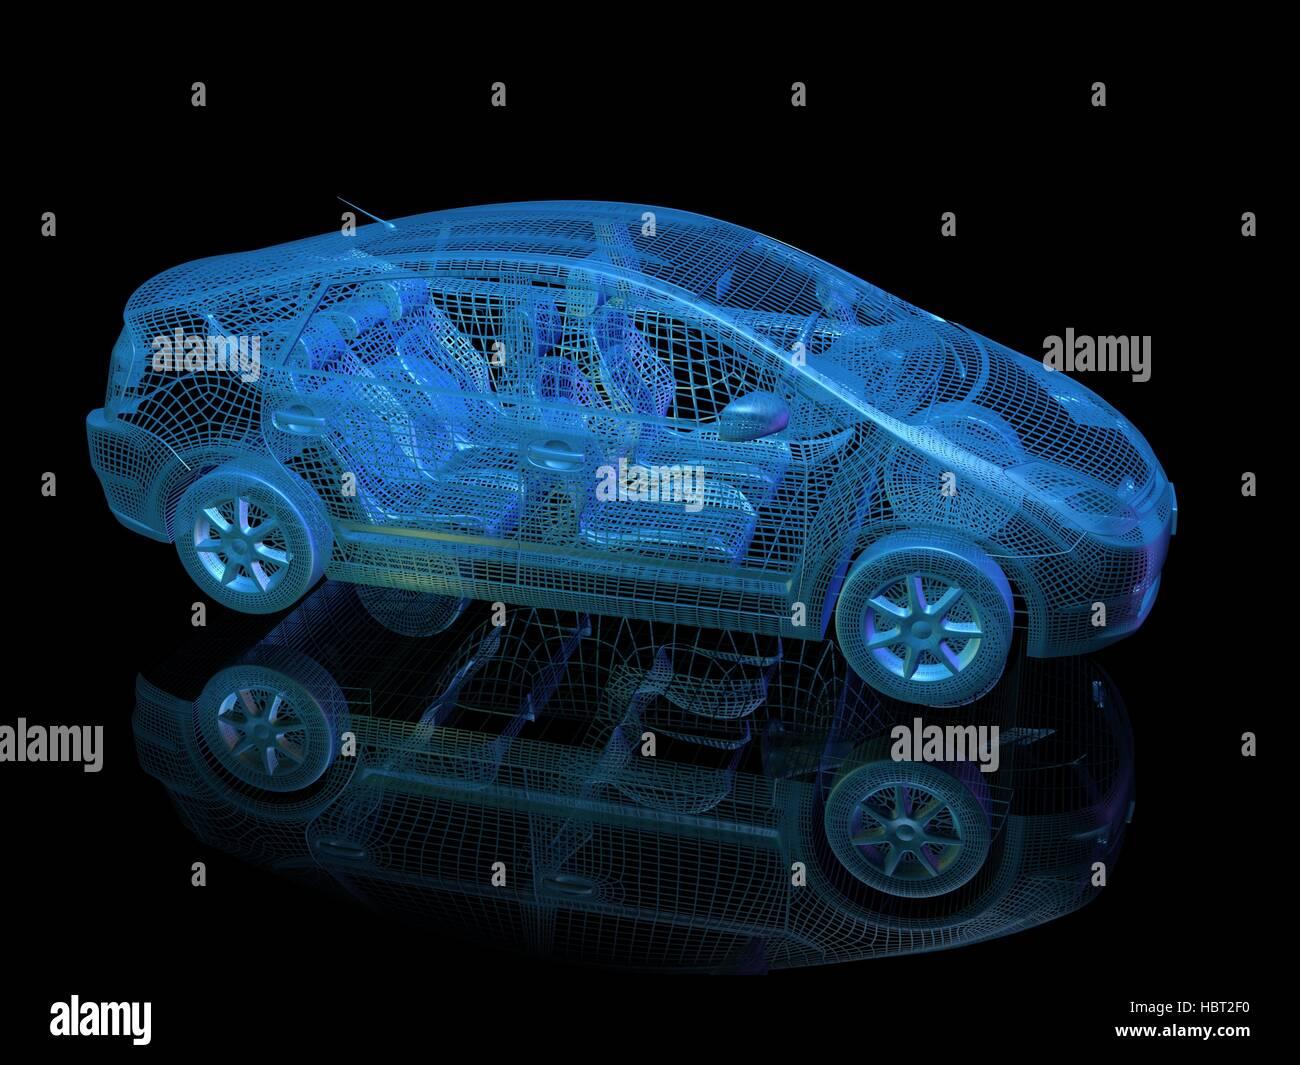 car engine diagram stock photos car engine diagram stock. Black Bedroom Furniture Sets. Home Design Ideas